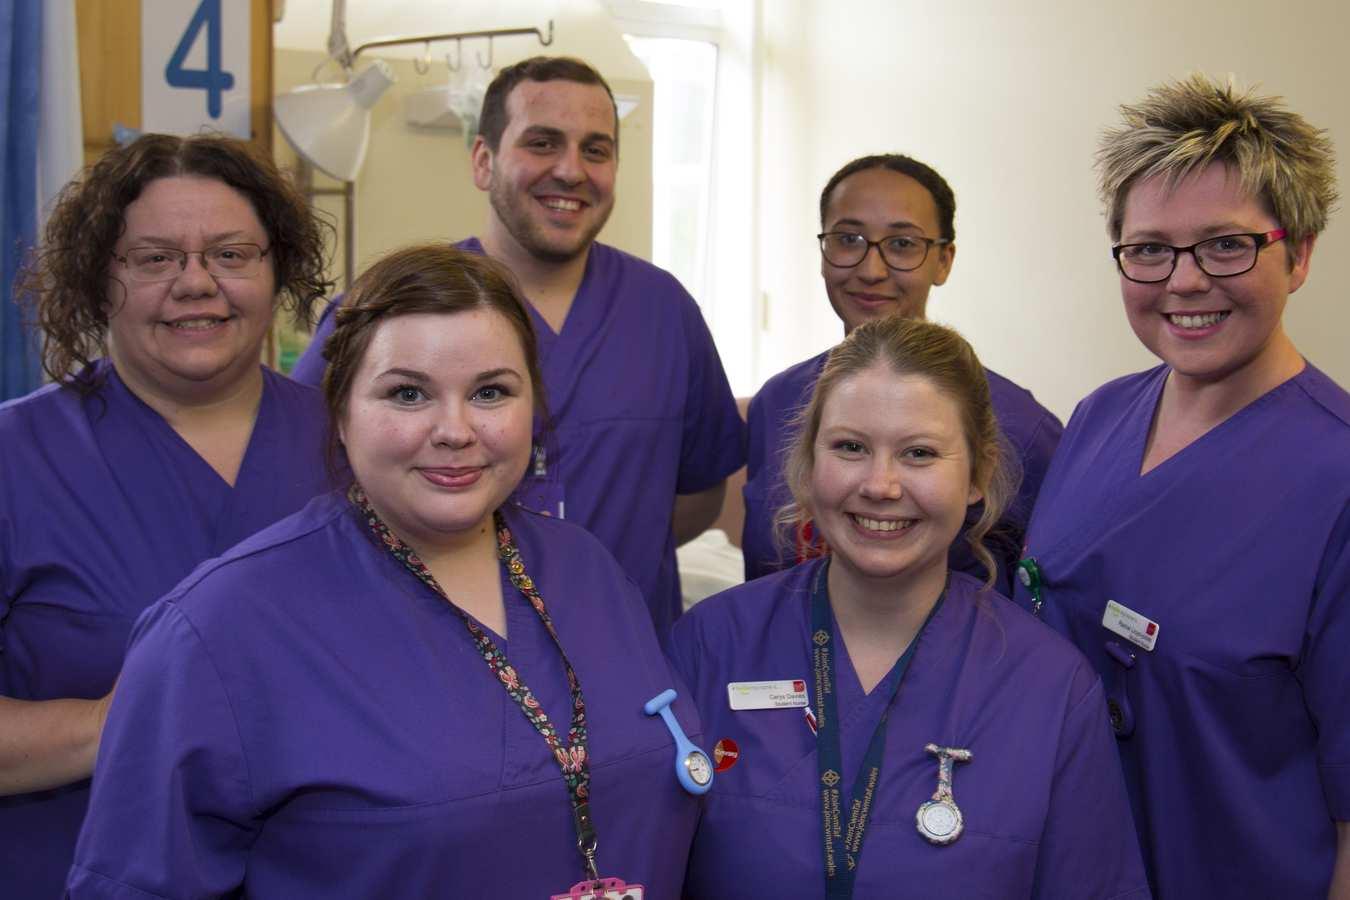 Team hydr8 - third year adult nursing students